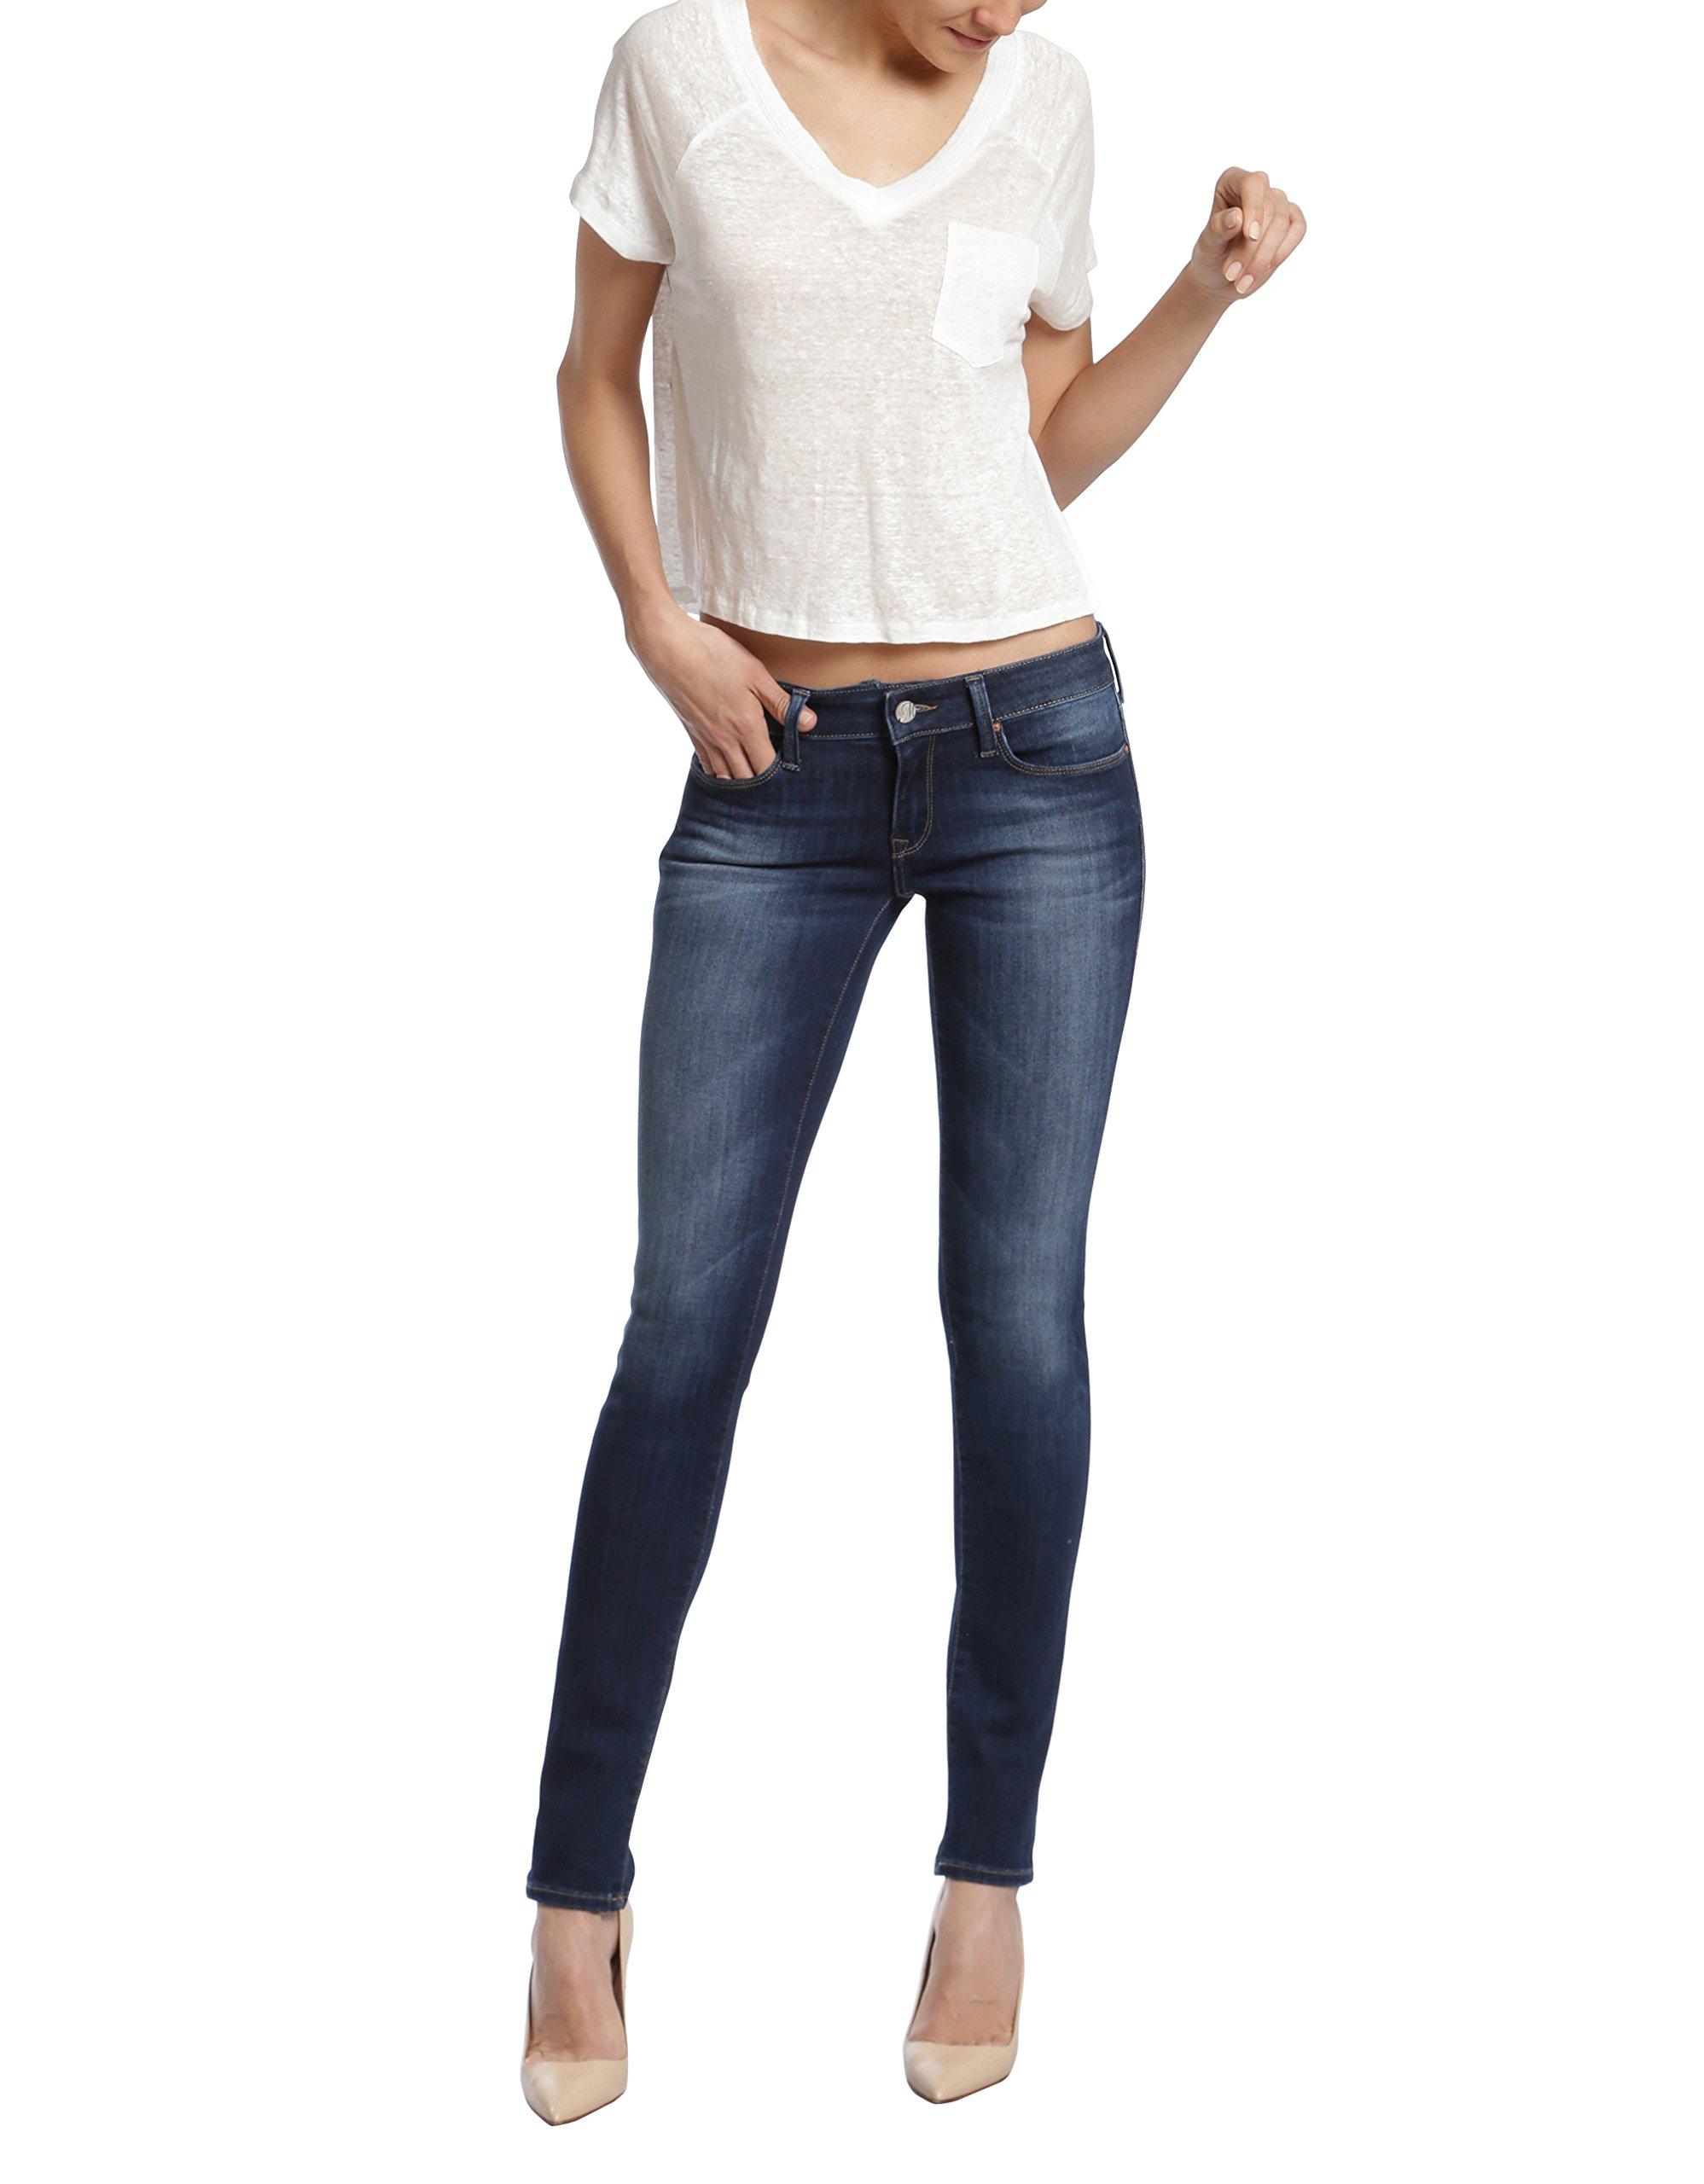 Mavi Jeans Women's Adriana Mid Rise Super Skinny, Indigo Tribeca, 27/32